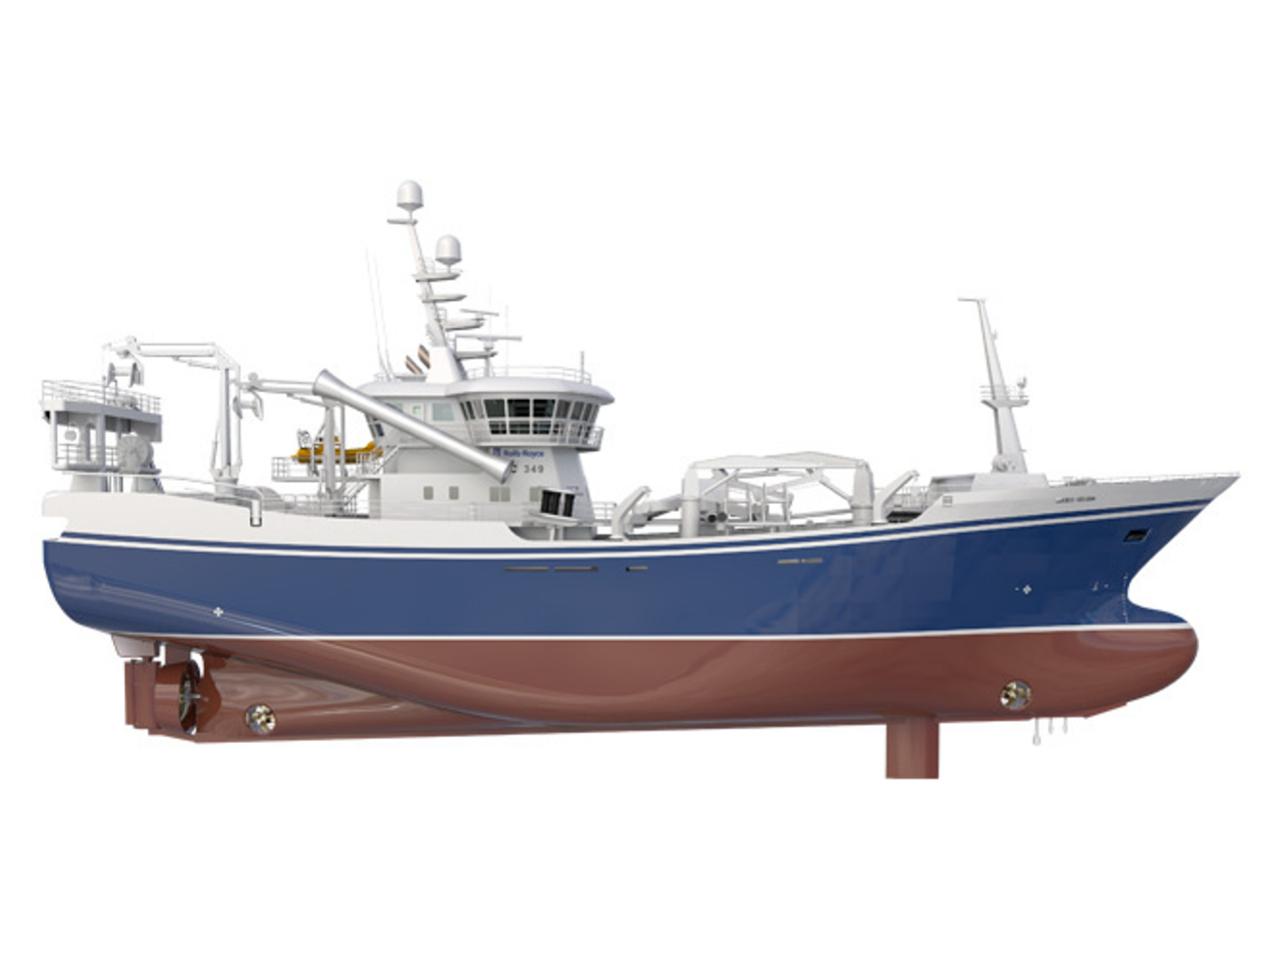 Mantenimiento a bordo de un Buque de Pesca